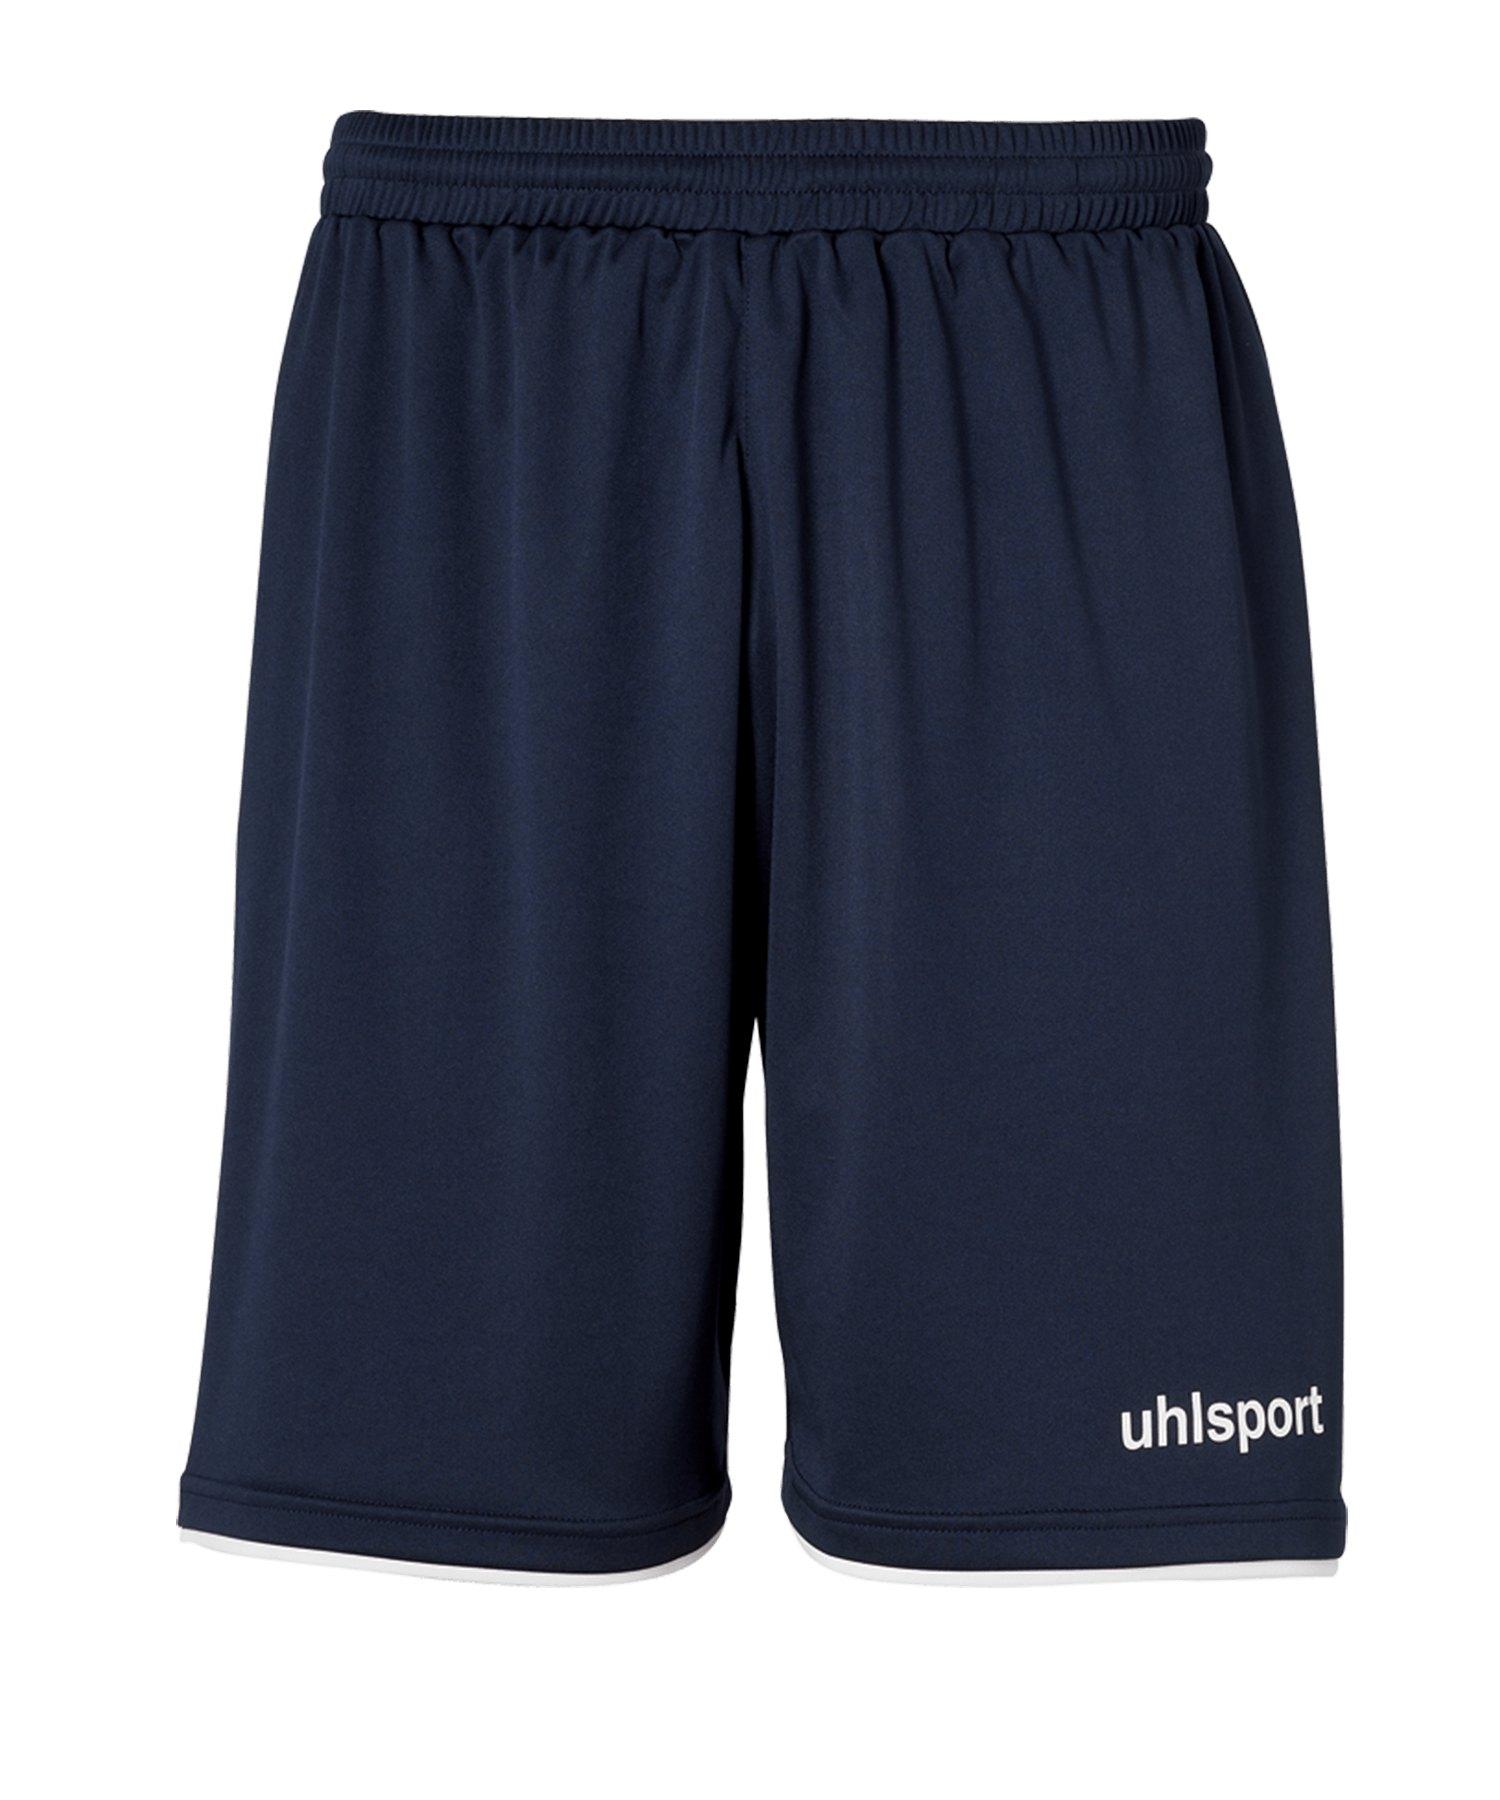 Uhlsport Club Short Kids Blau F10 - blau